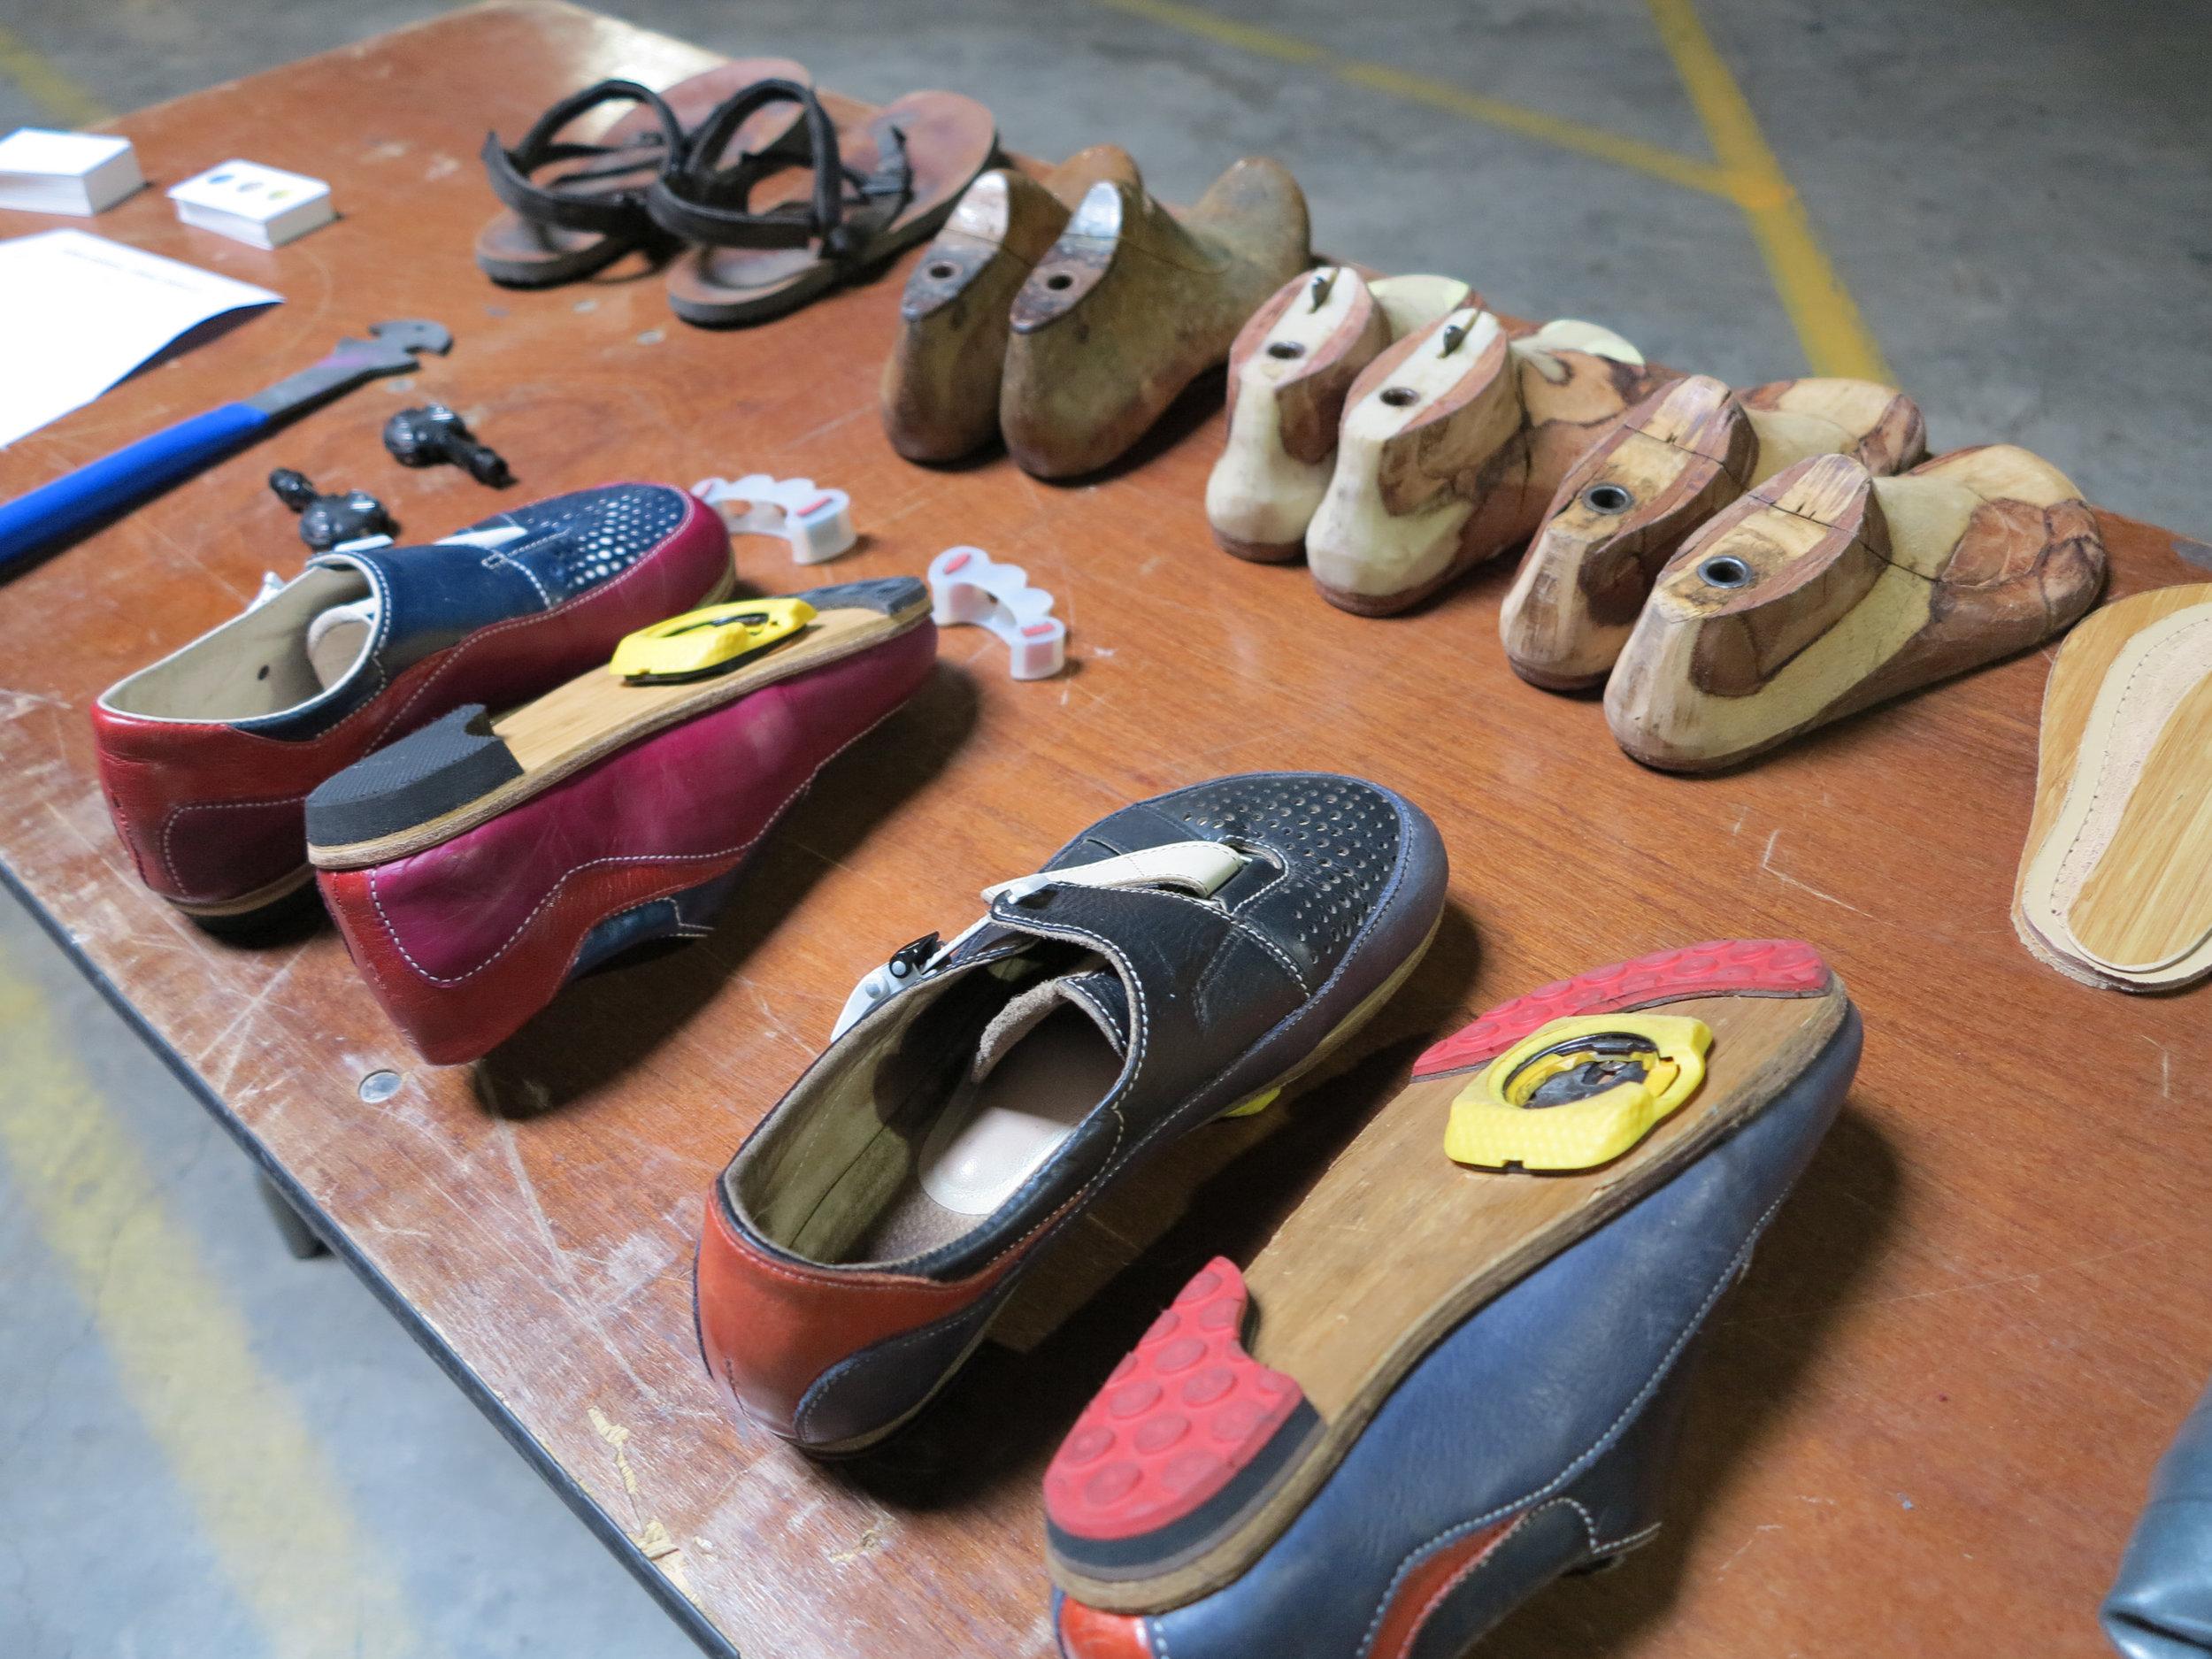 Astra cycling shoe